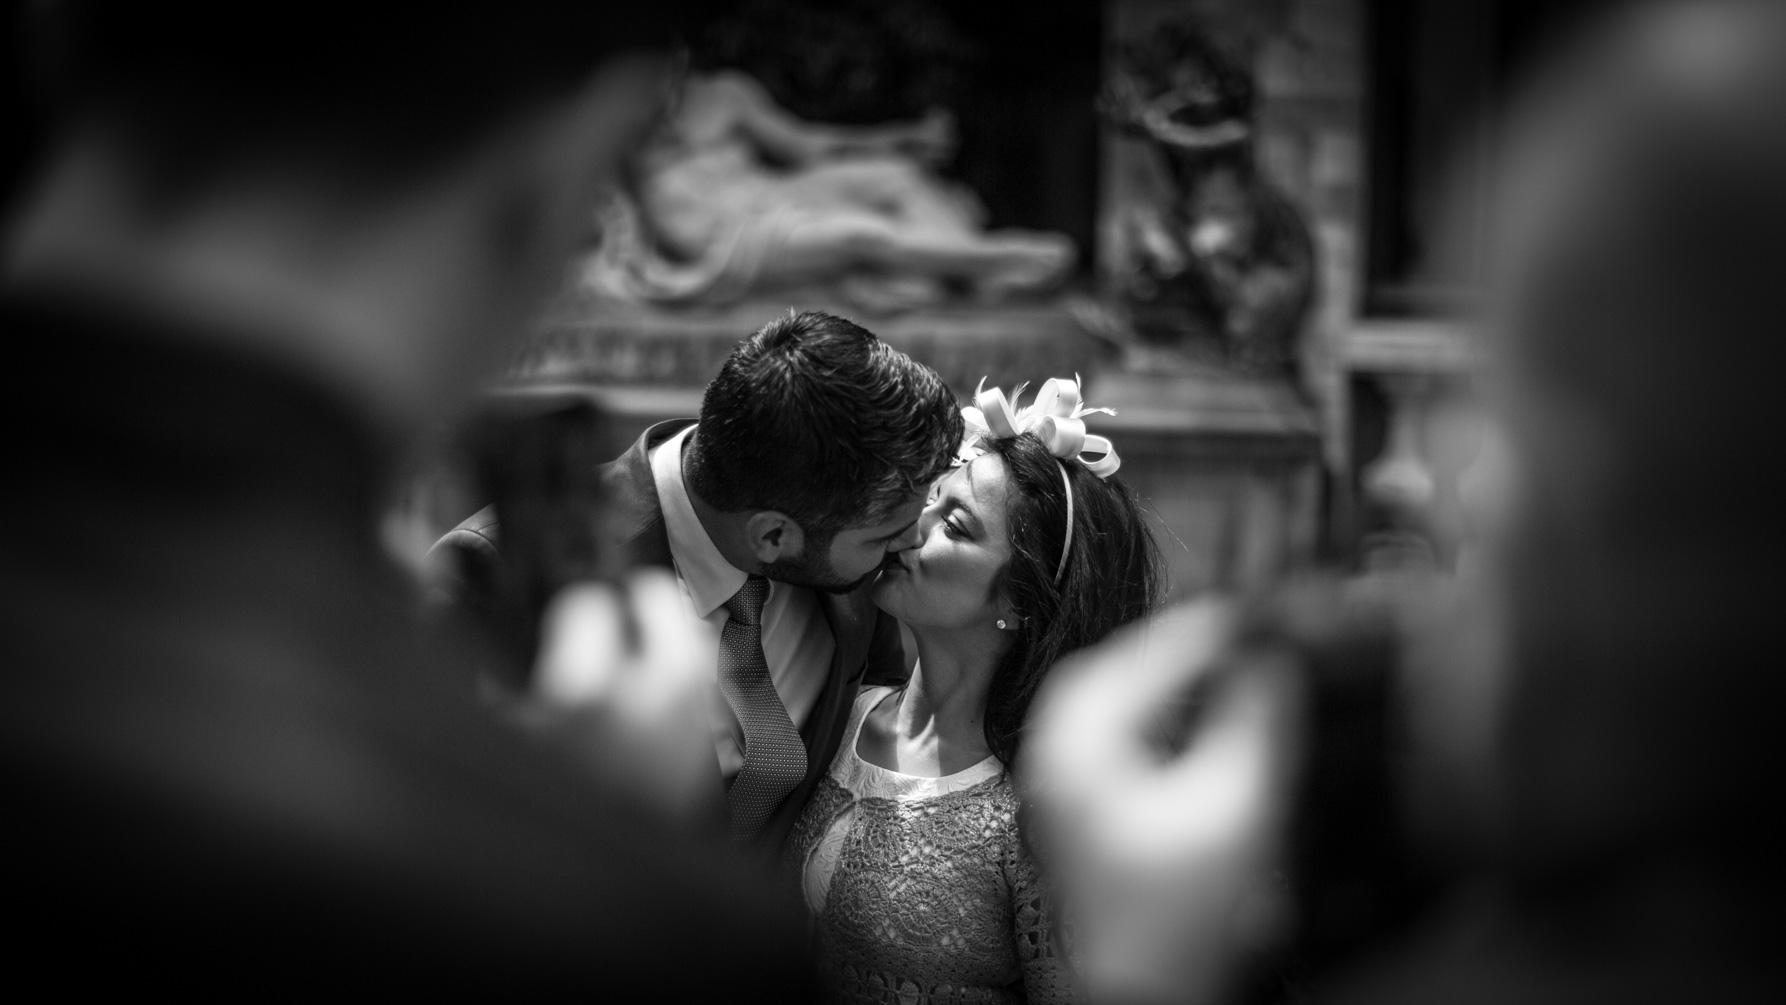 mariage-photo-noir-et-blanc.jpg